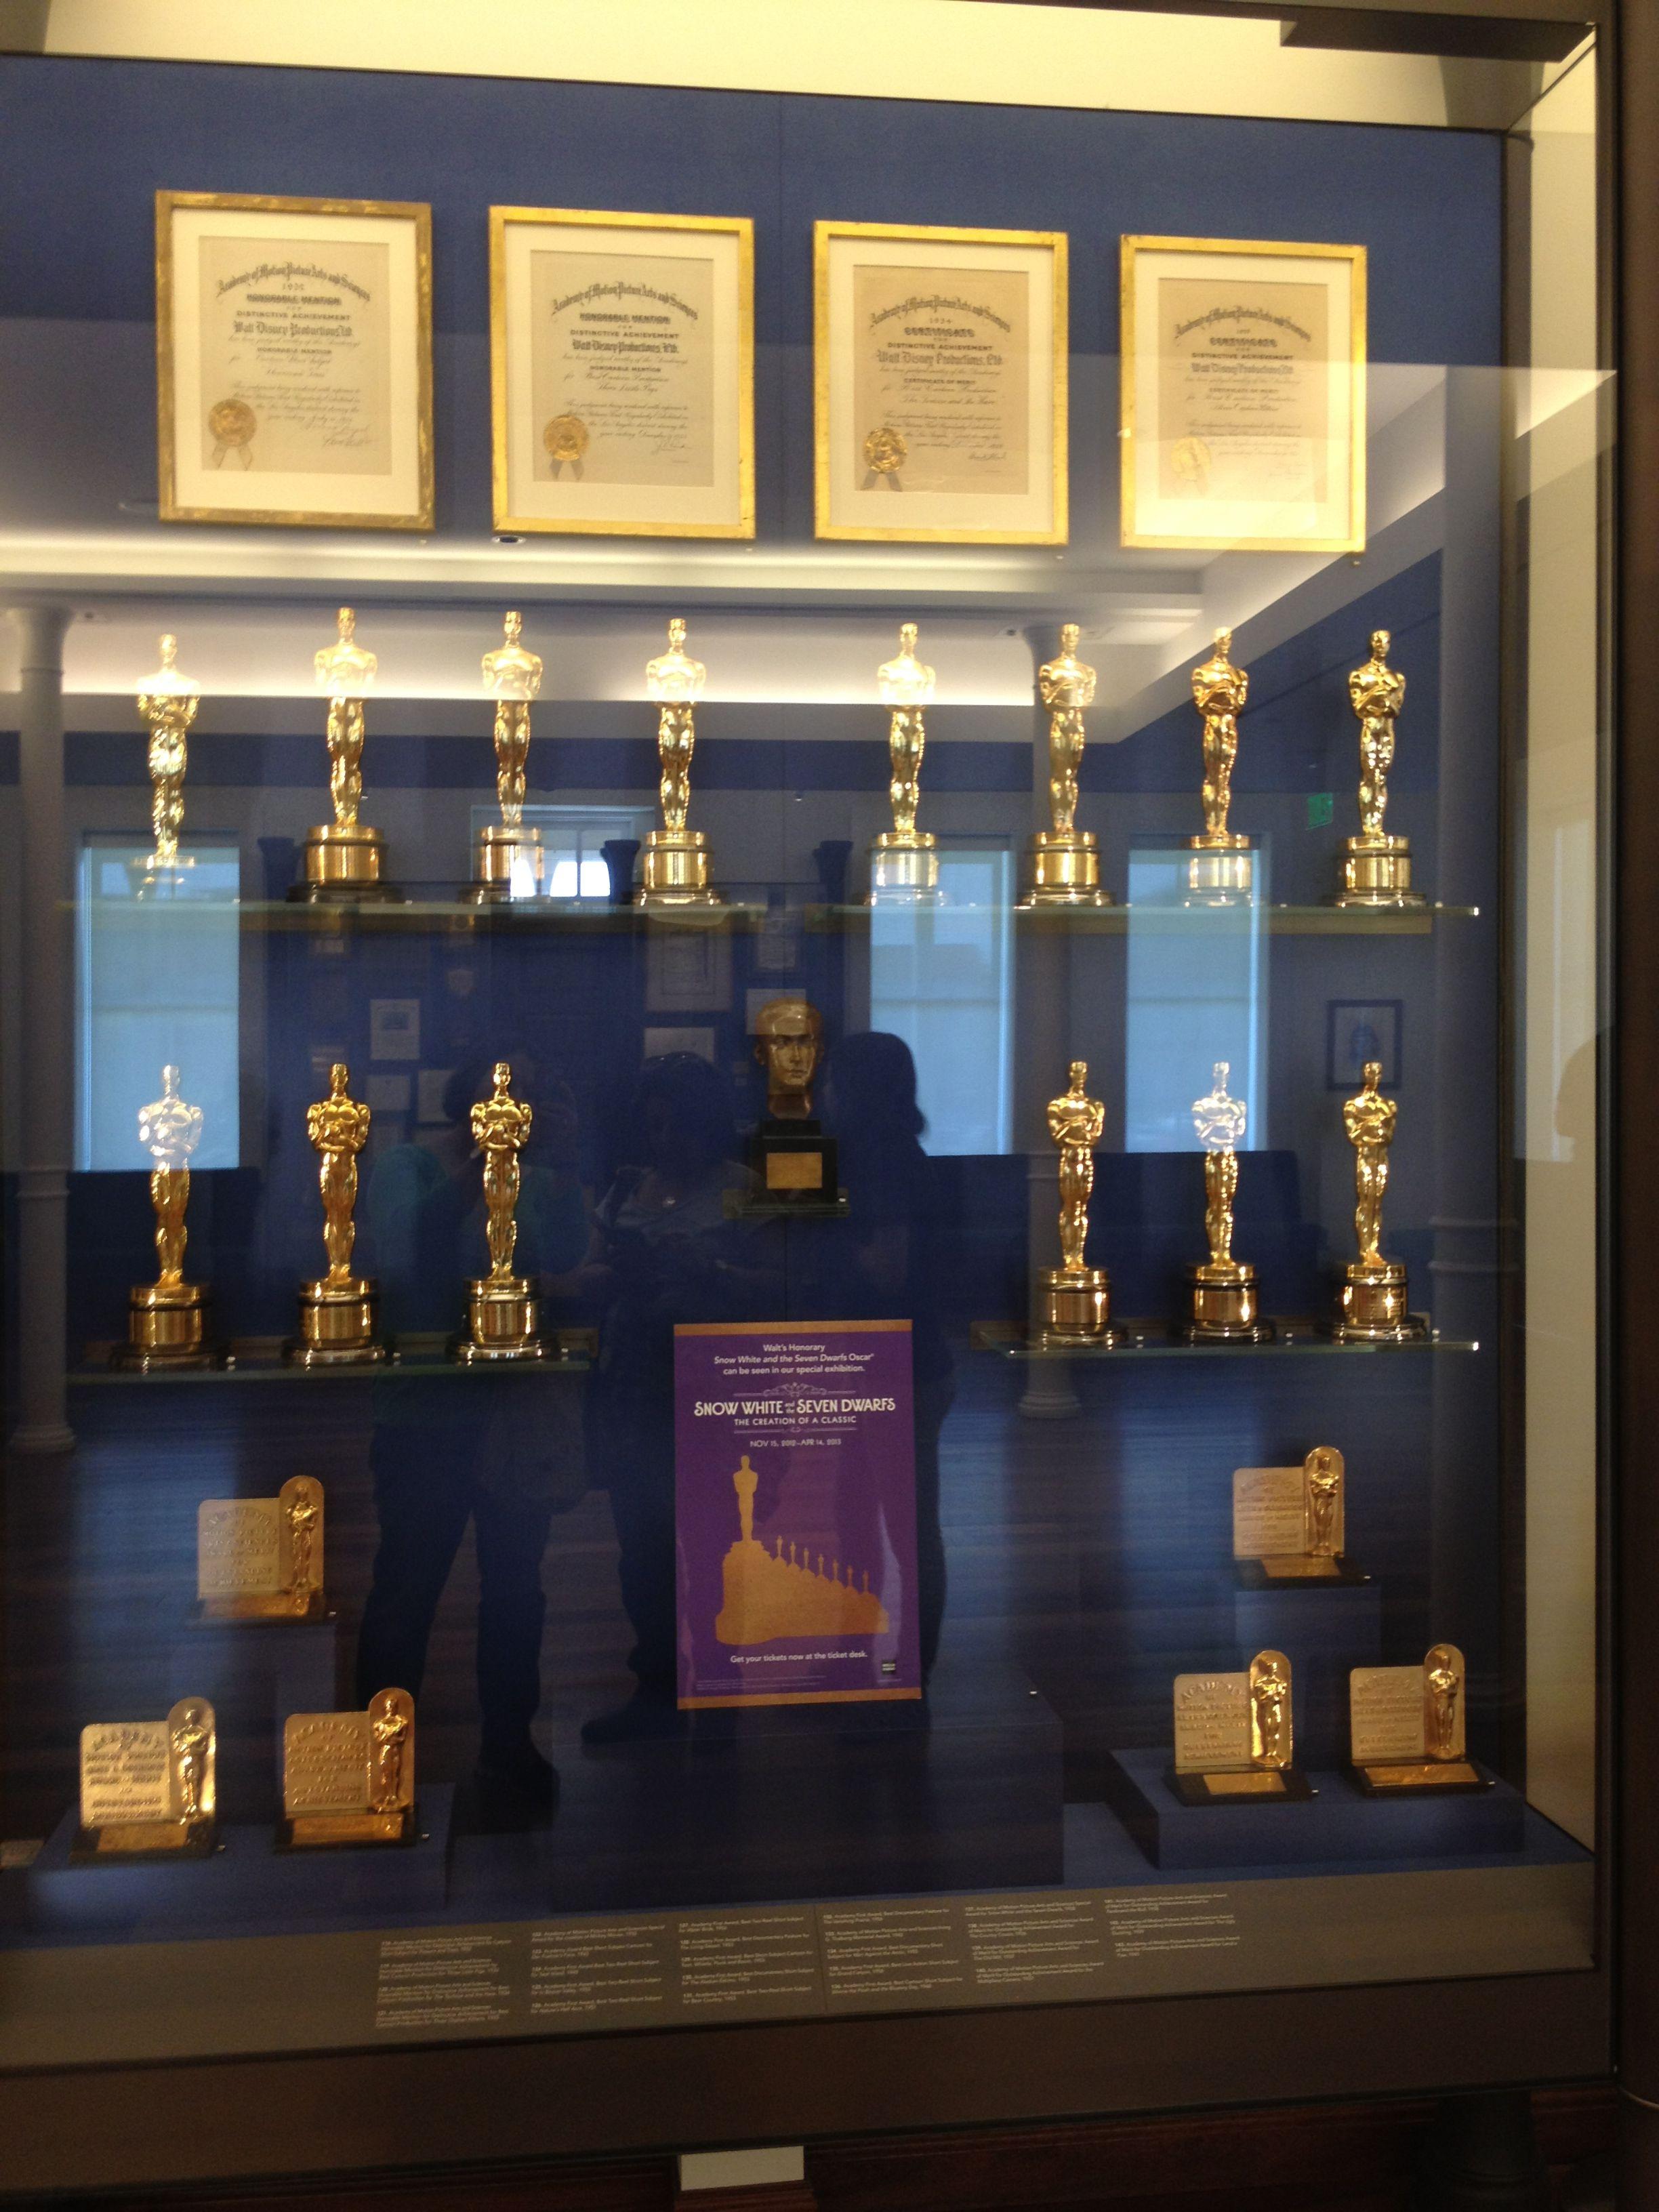 All the Academy awards Disney has won. Taken at the Disney